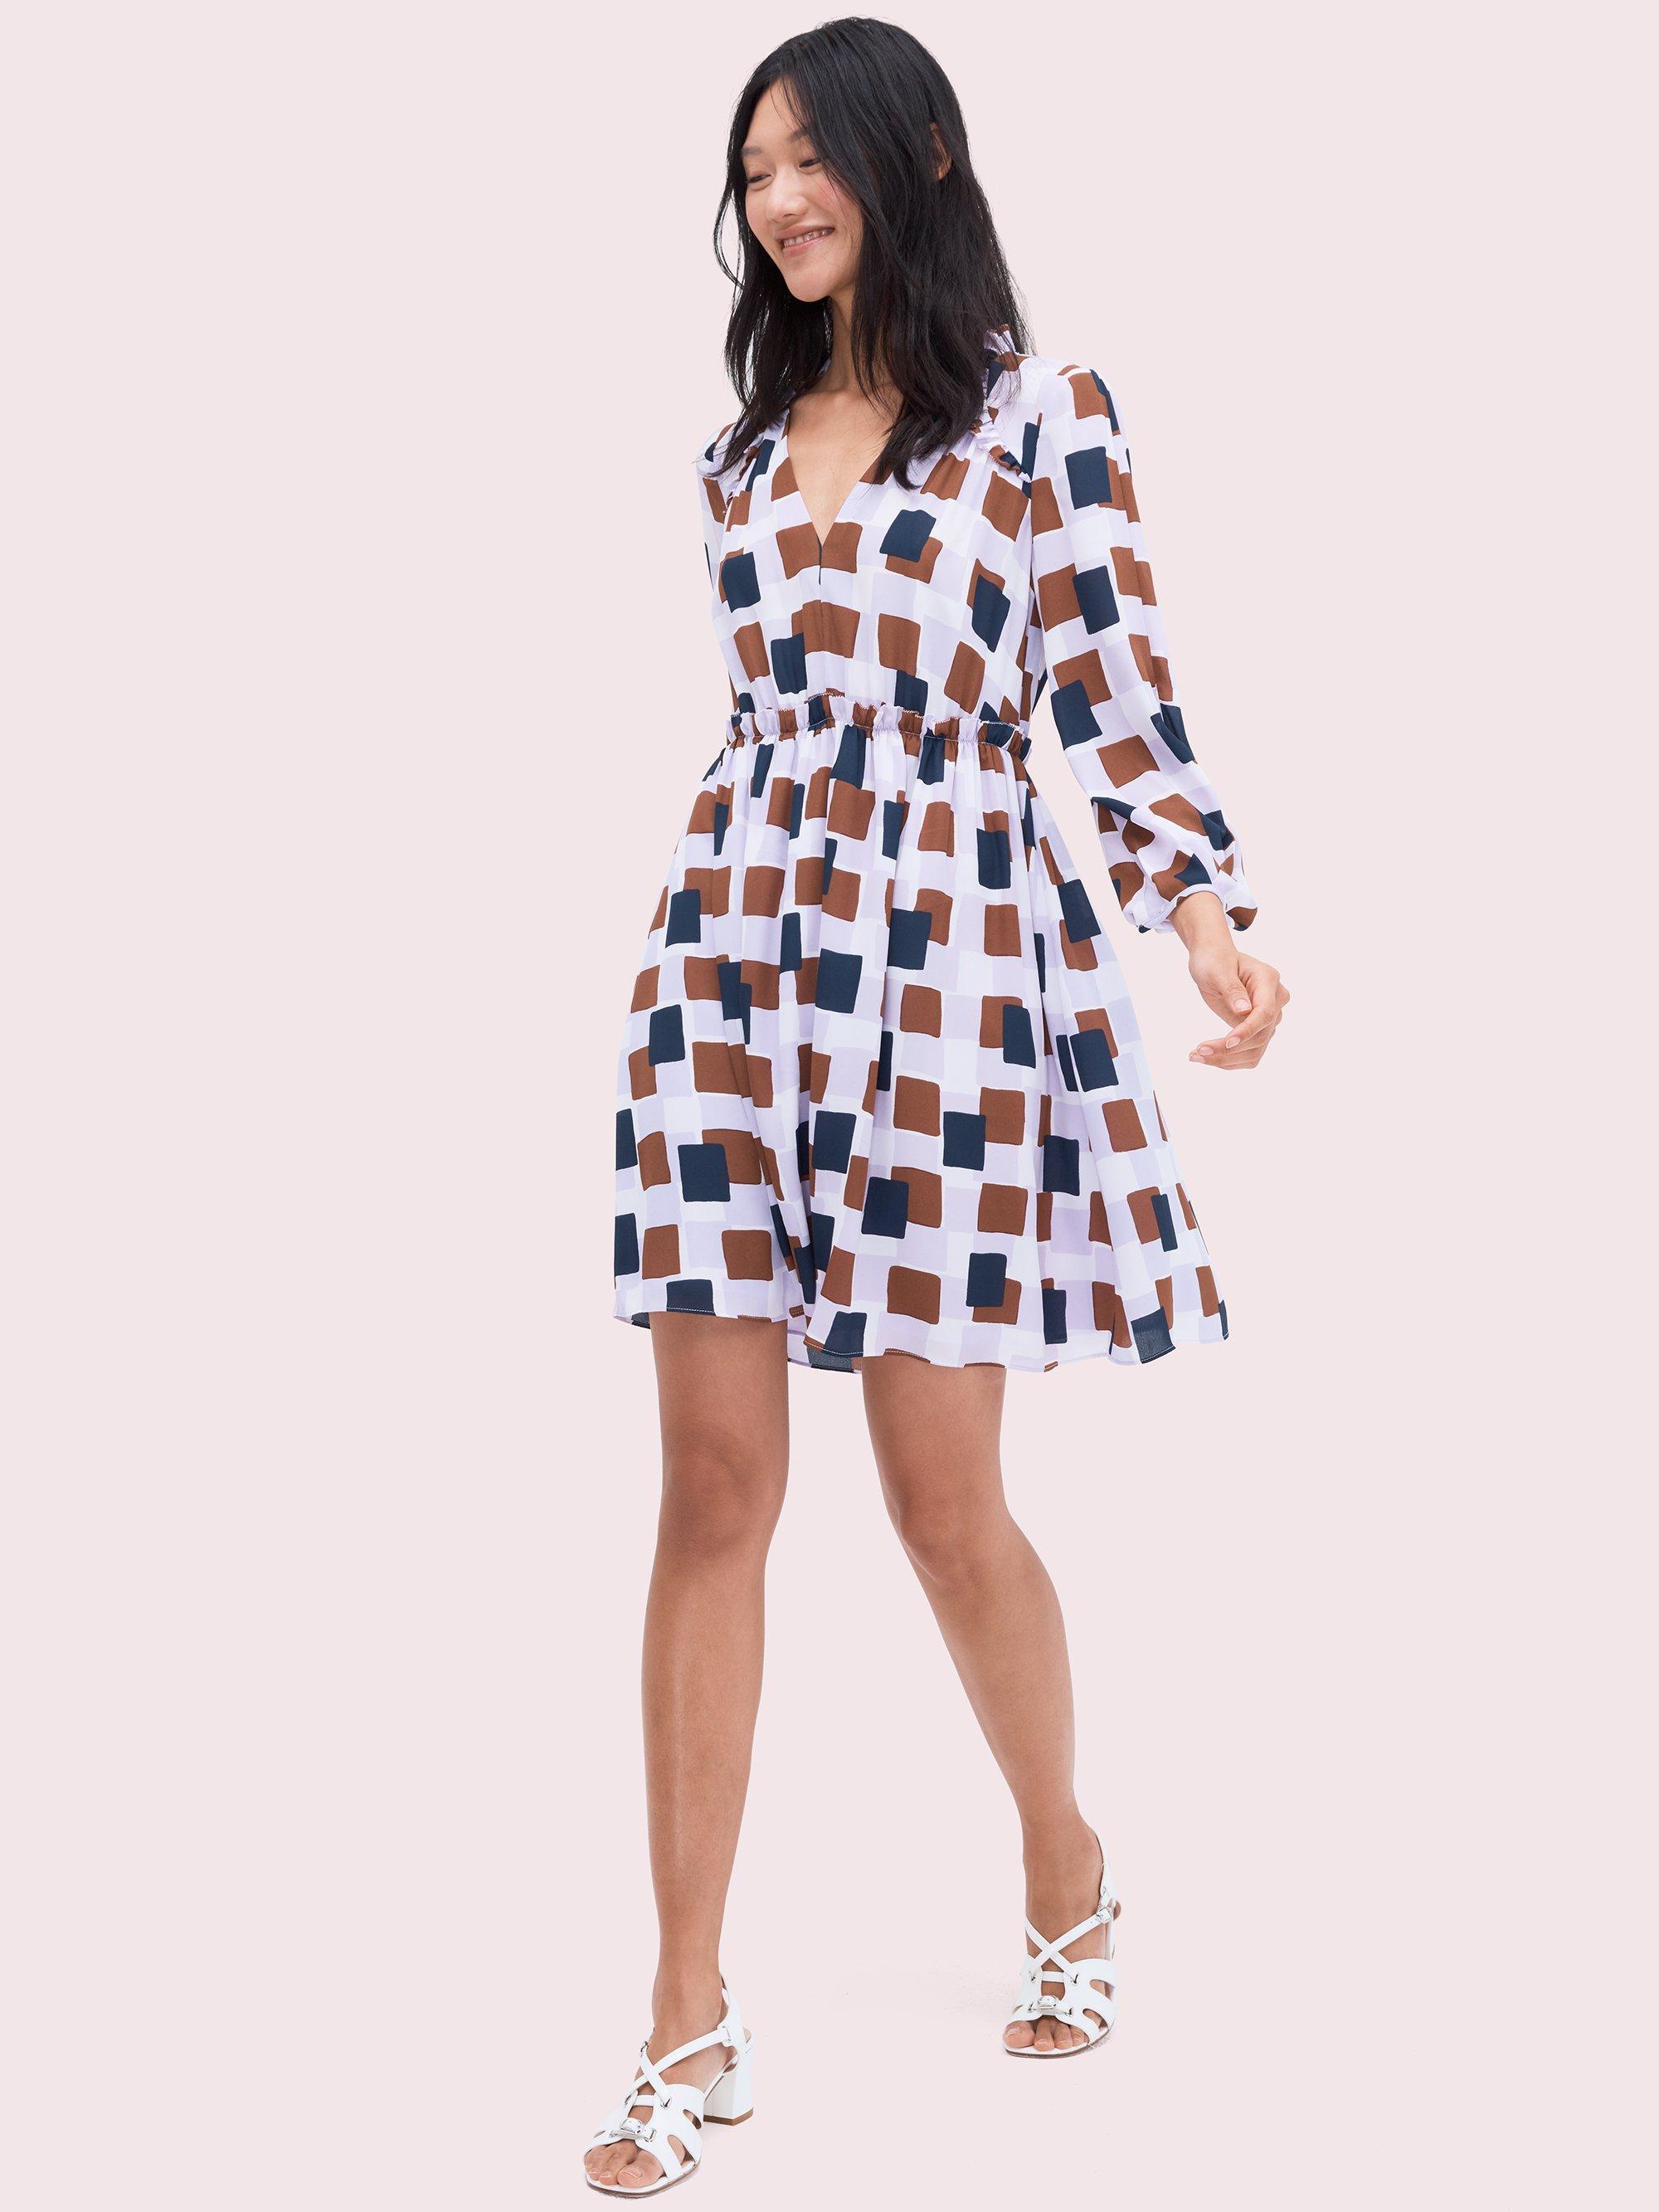 d04f93923844 Kate Spade. Women's Geo Squares Mini Dress